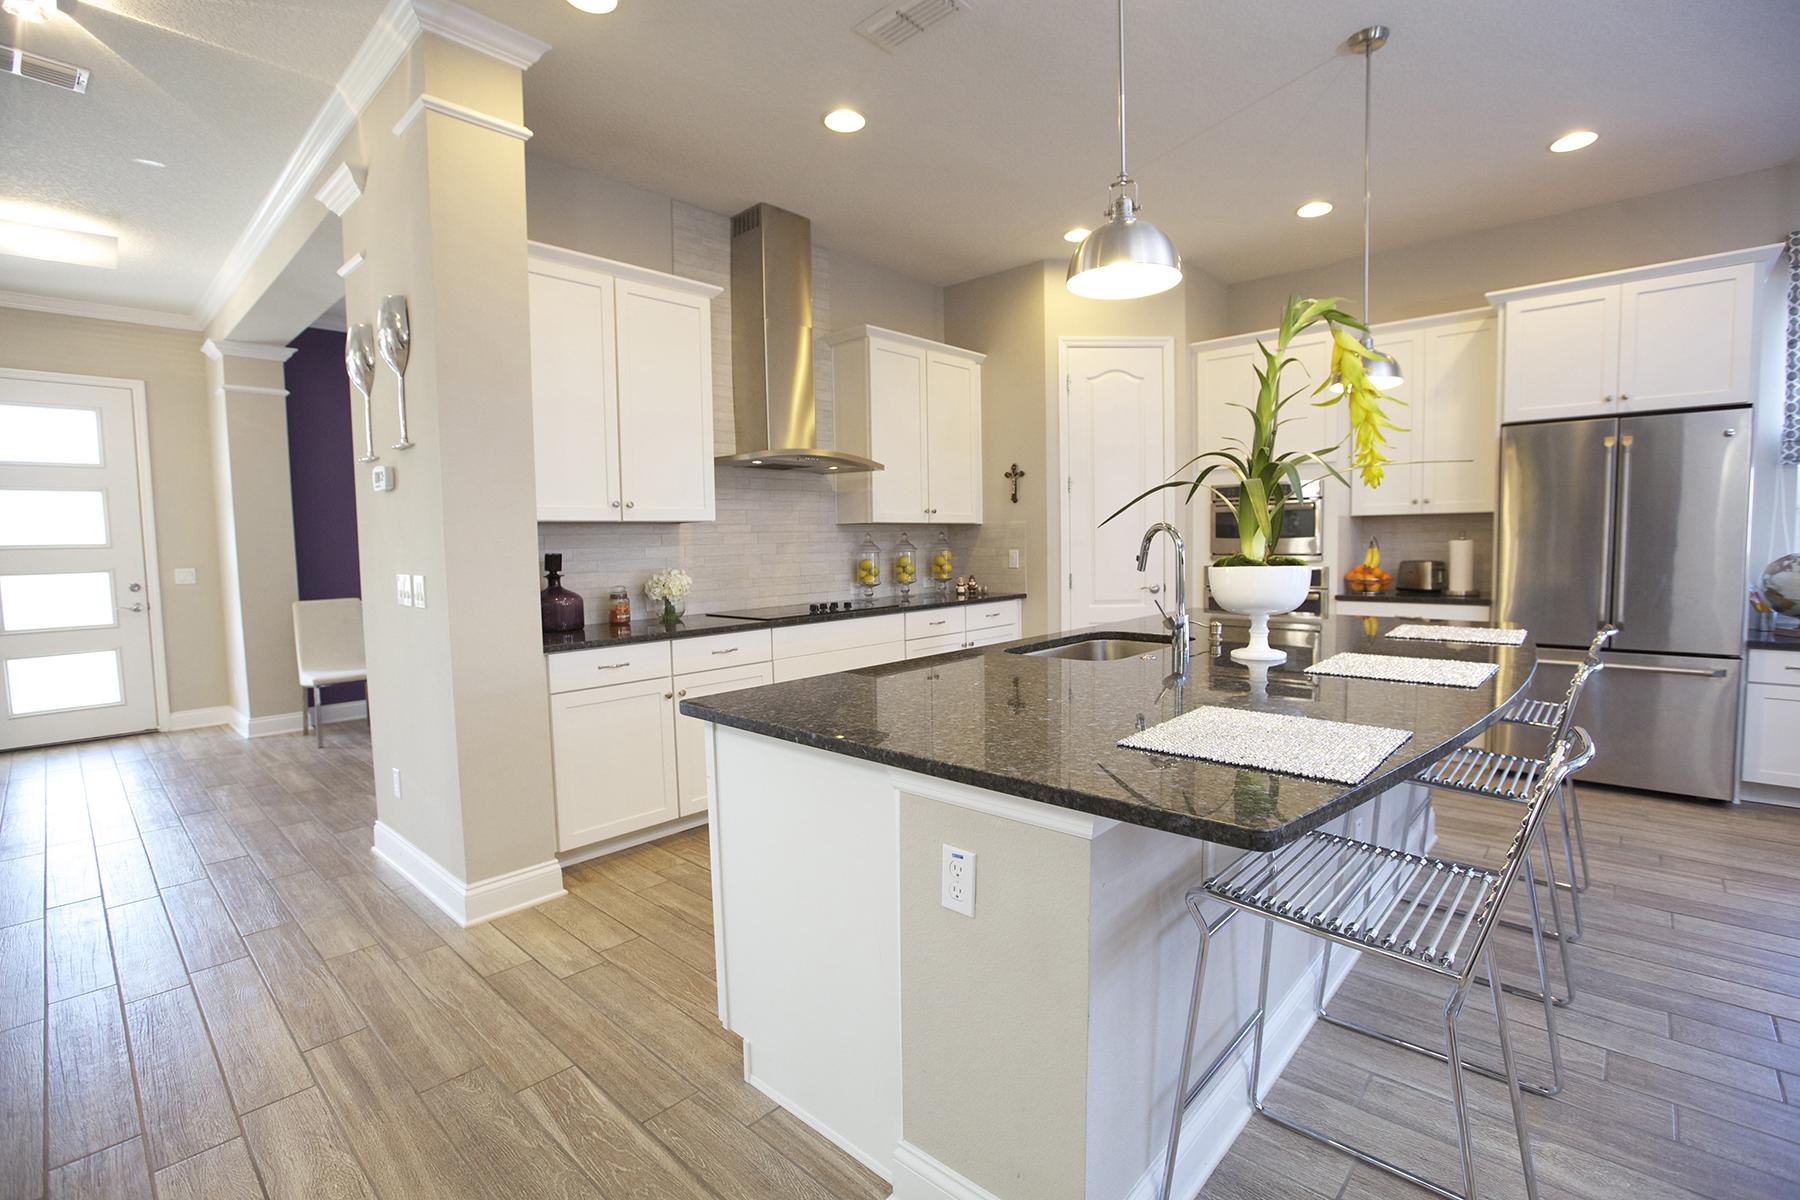 Single Family Home for Sale at ORLANDO 13831 Briand Ave, Orlando, Florida 32827 United States